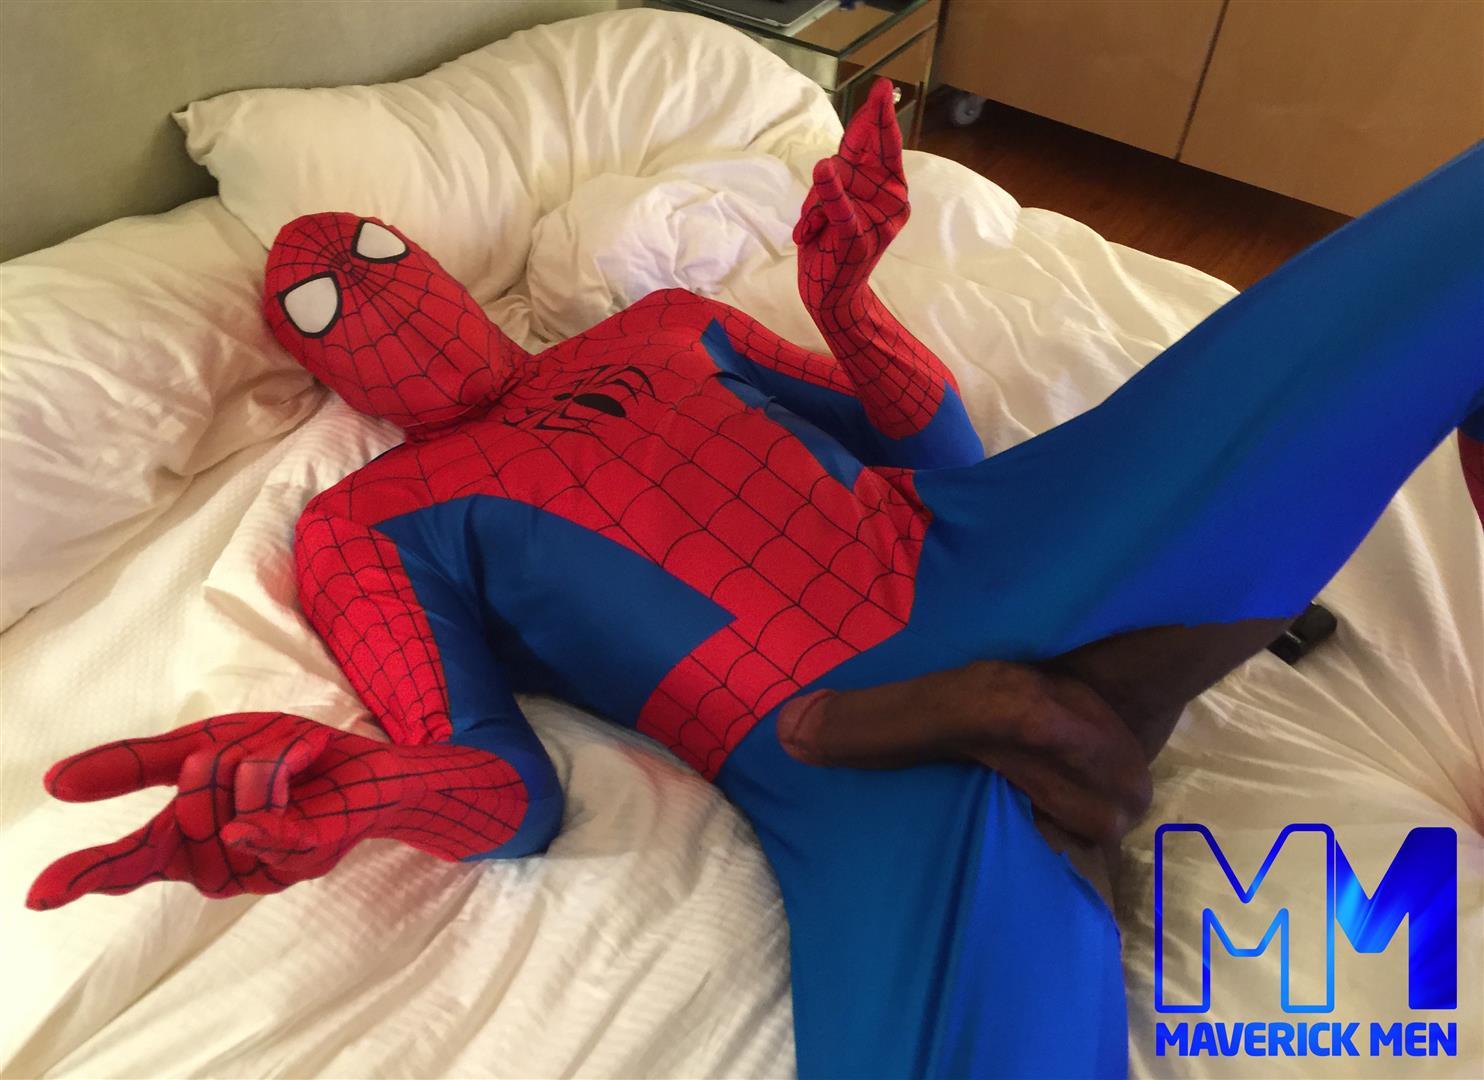 Maverick Men Spiderman With A Big Black Dick Bareback Threesome Amateur Gay Porn 01 Happy Halloween... Did You Know That Spiderman Has A Big Black Dick?